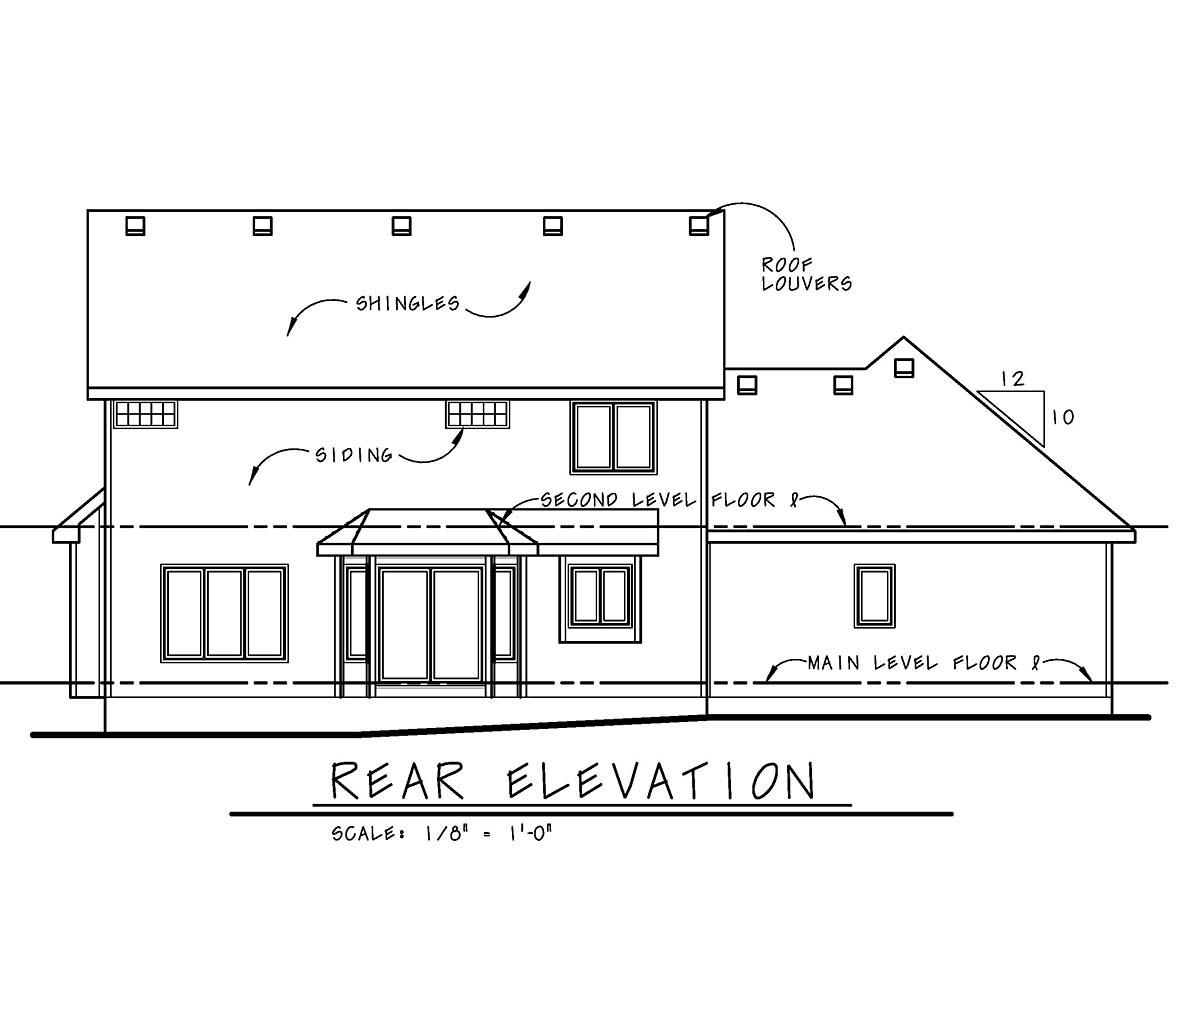 Craftsman House Plan 97951 with 3 Beds, 3 Baths, 2 Car Garage Rear Elevation